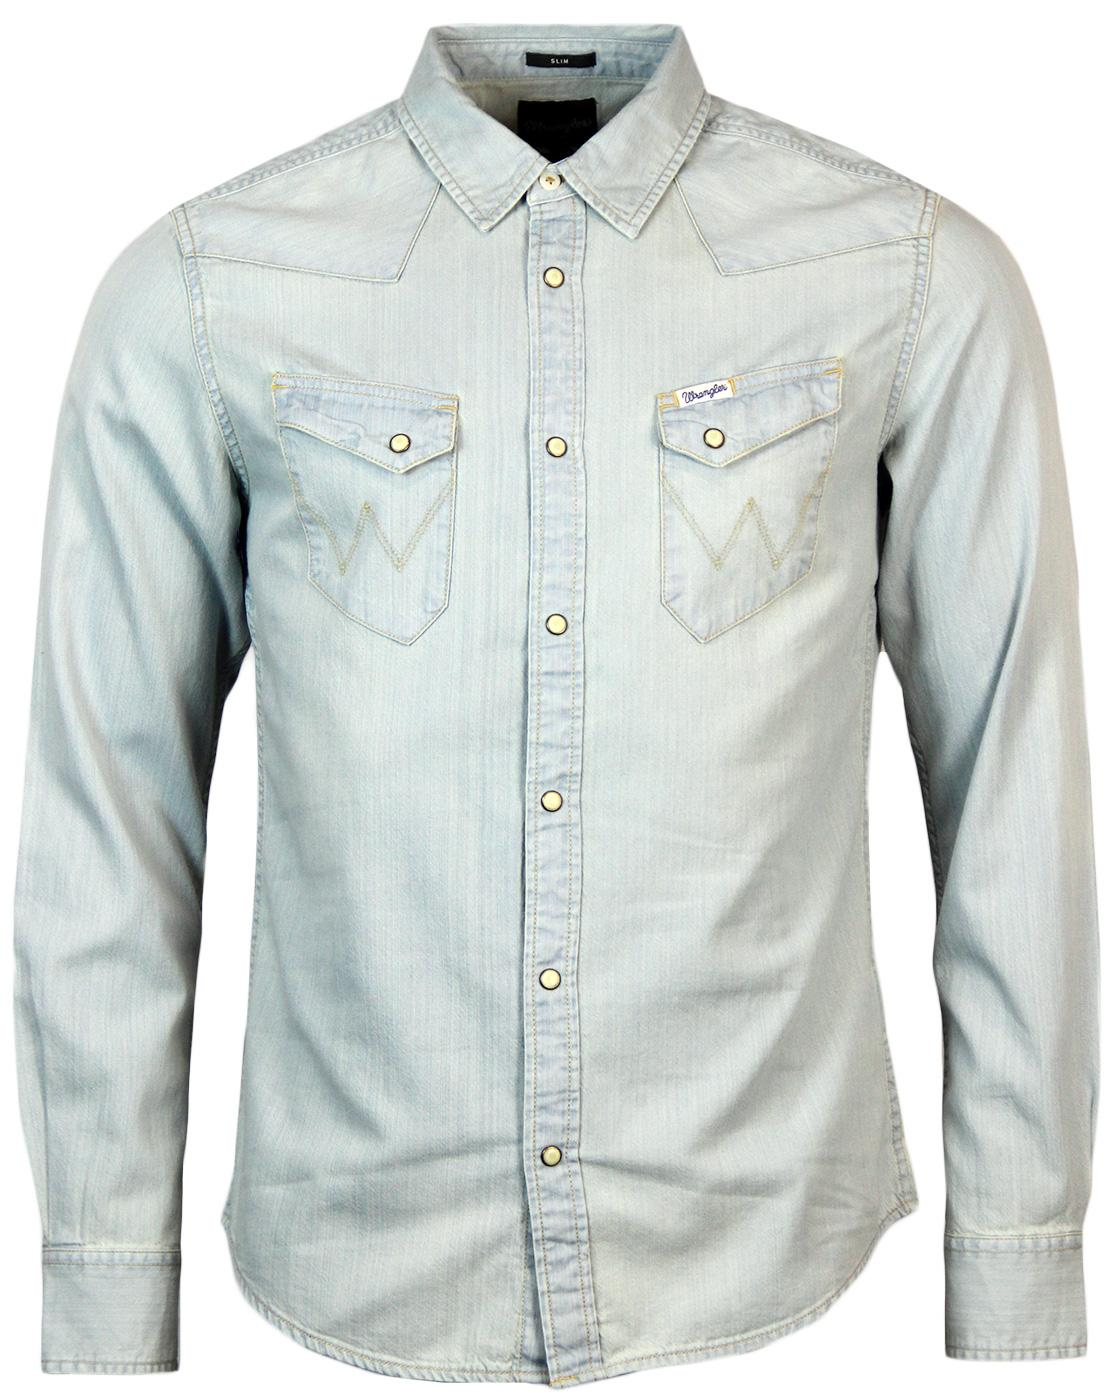 4b60189885 WRANGLER City Western Retro Seventies Denim Shirt in Super Bleach